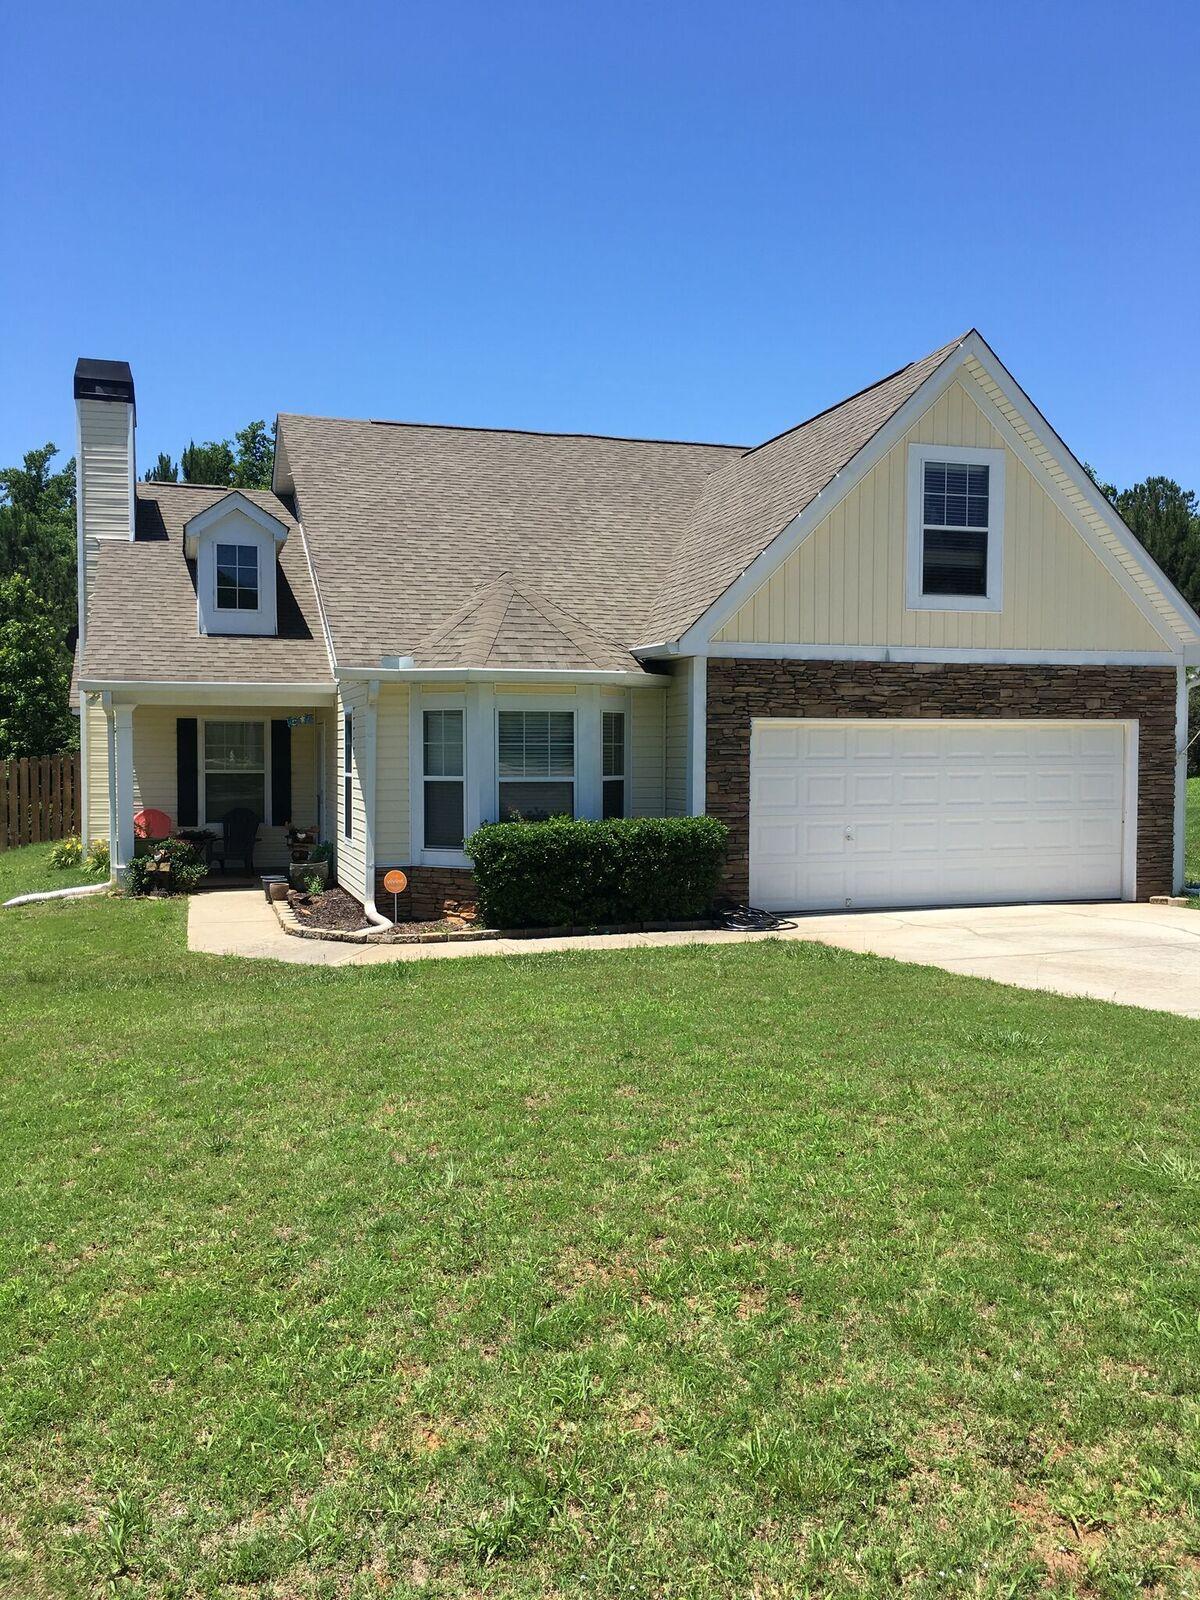 Photo of 124 Meadowbrook Ln, Grantville, GA, 30220